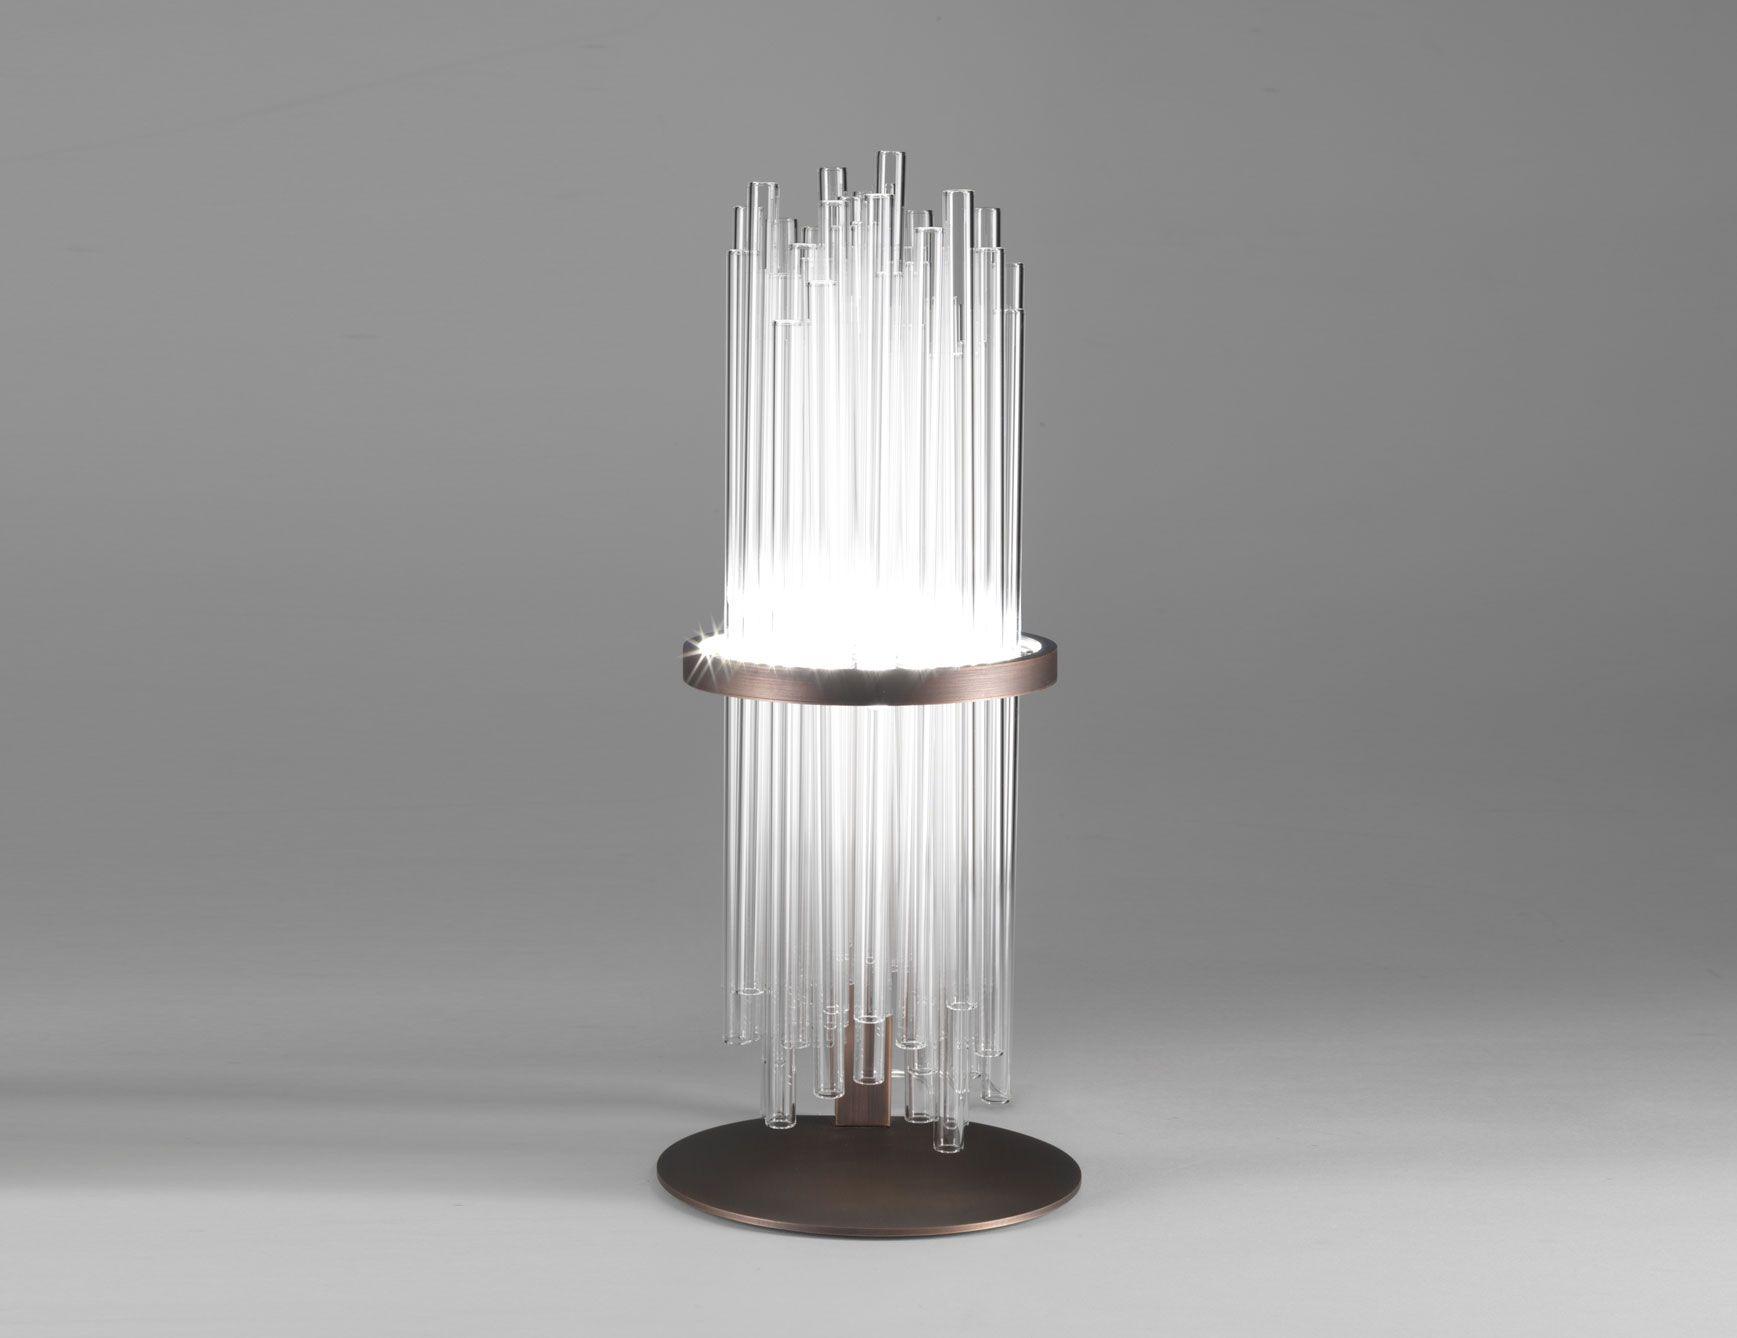 Tubular minimalist glass table lamp feel inspired luxxu interiors tubular minimalist glass table lamp arubaitofo Gallery